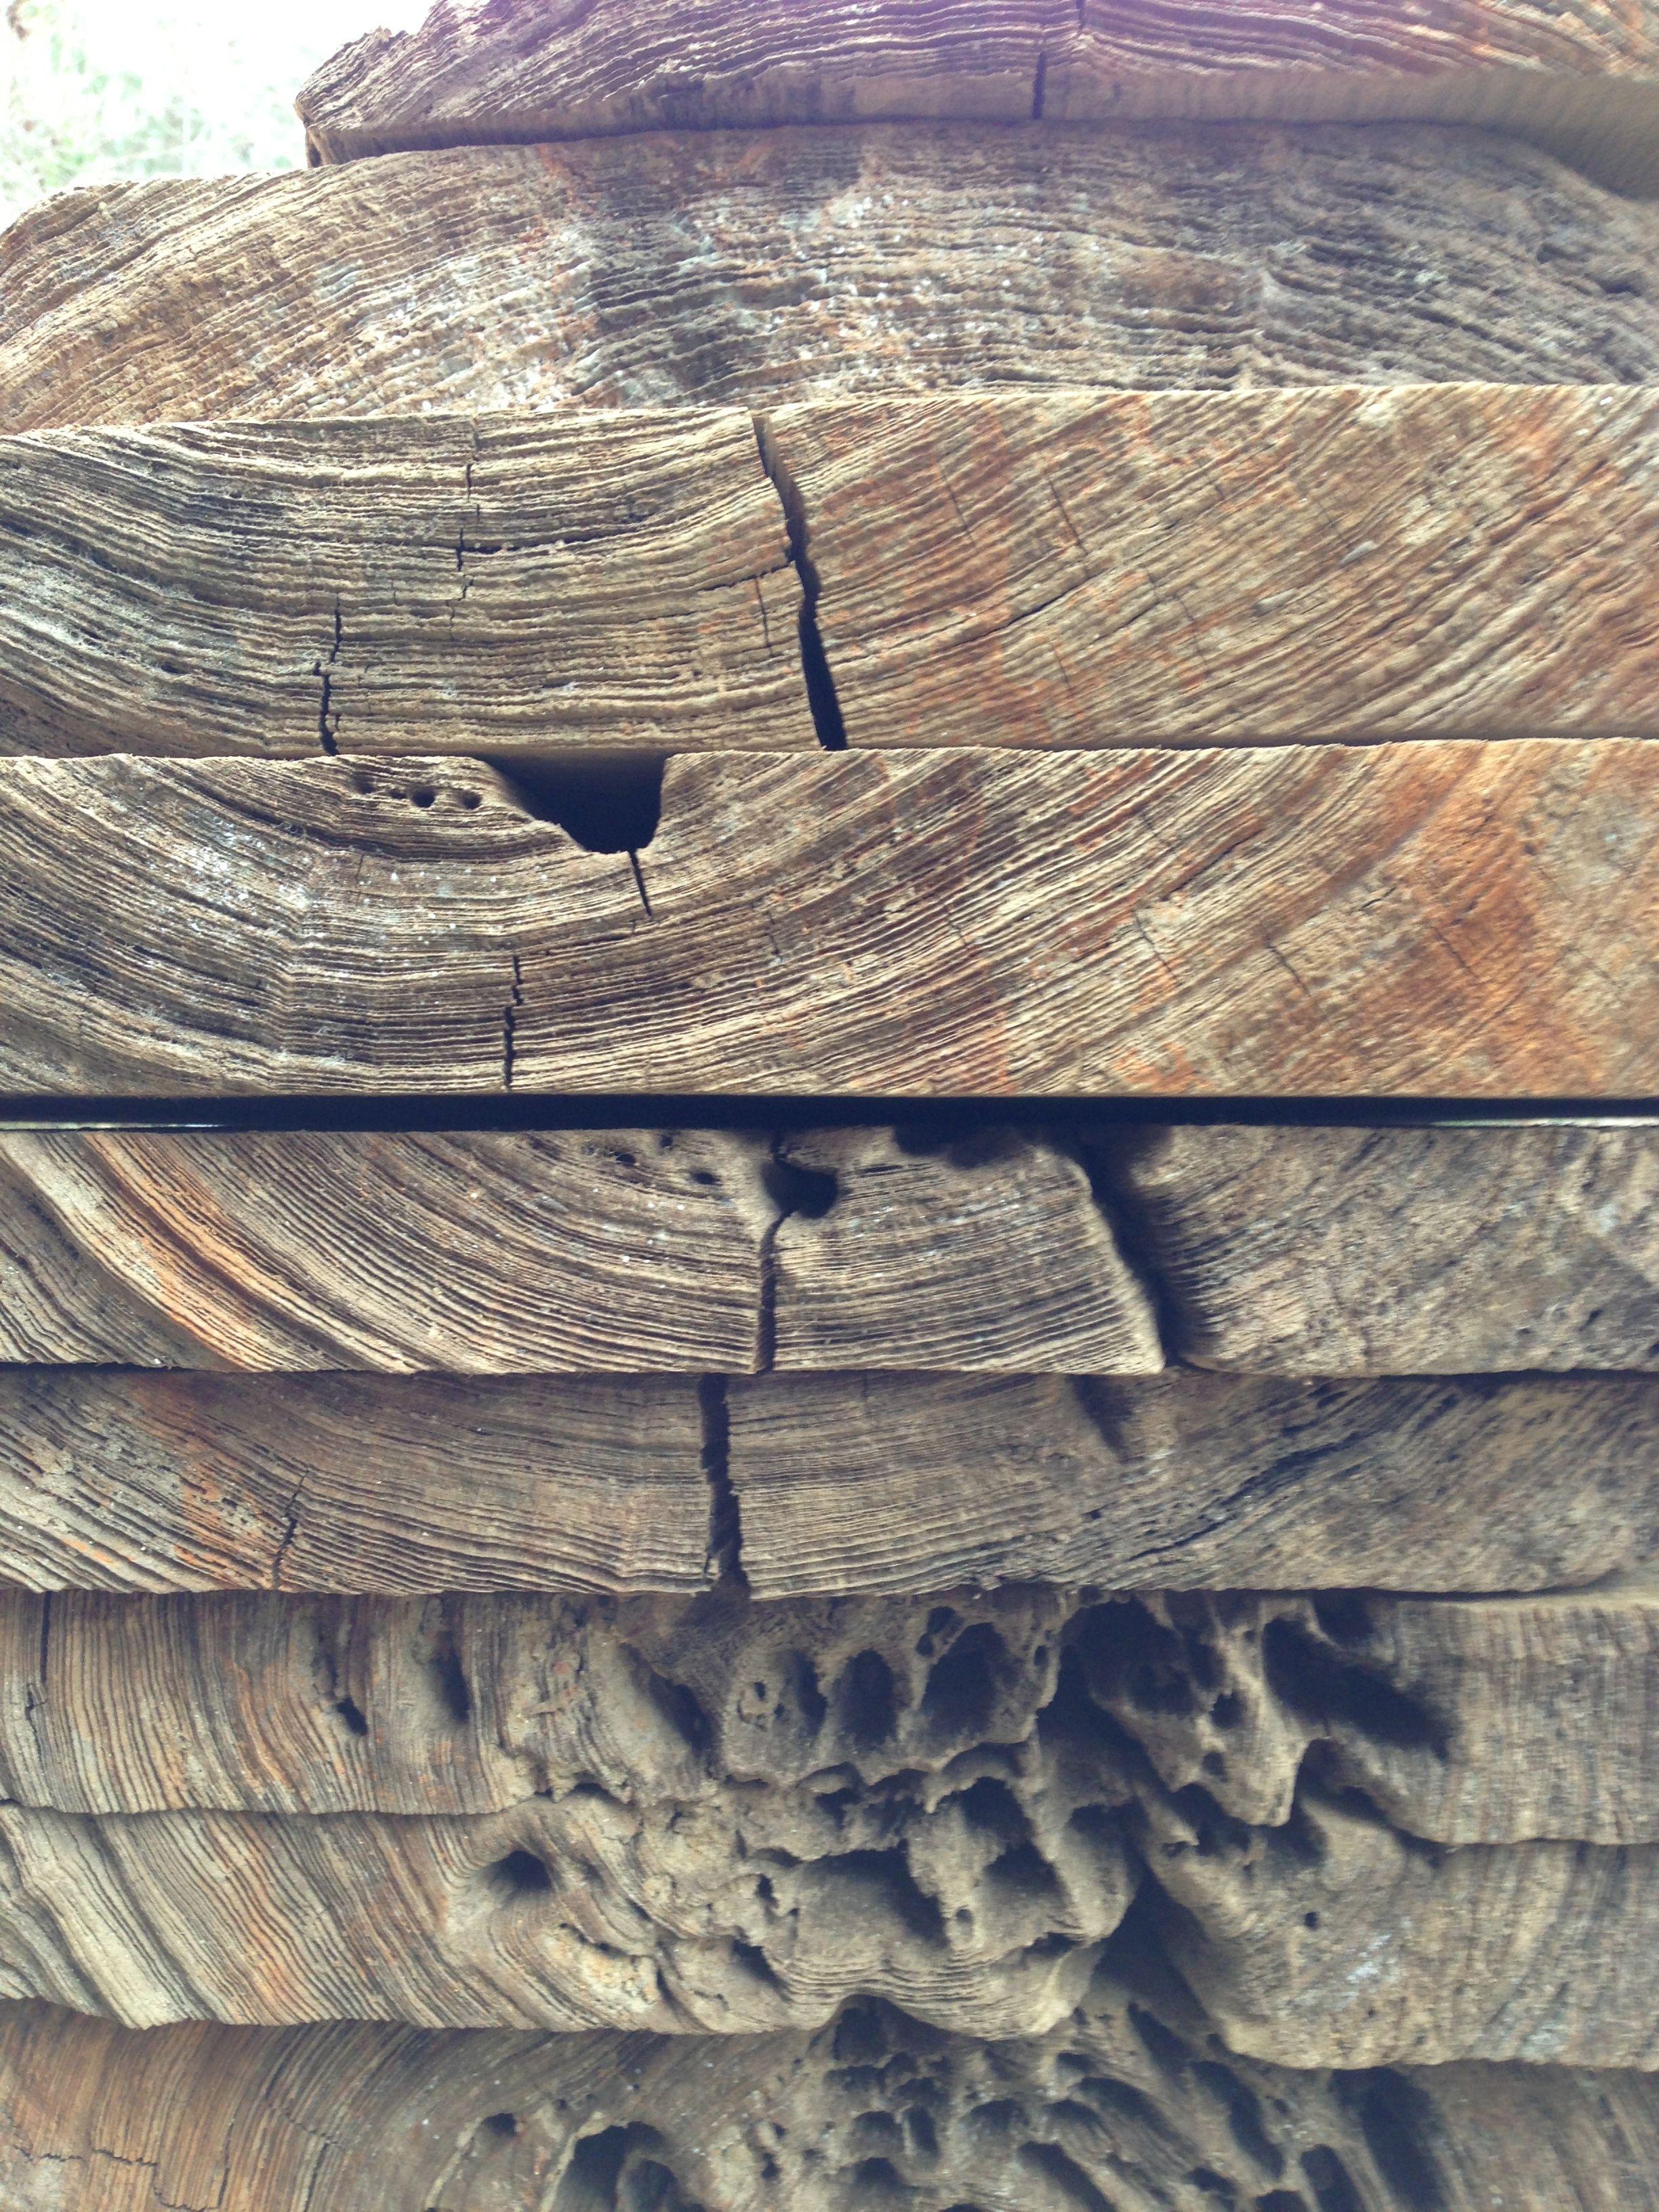 Virgin live edge sinker cypress wood slab from under the black